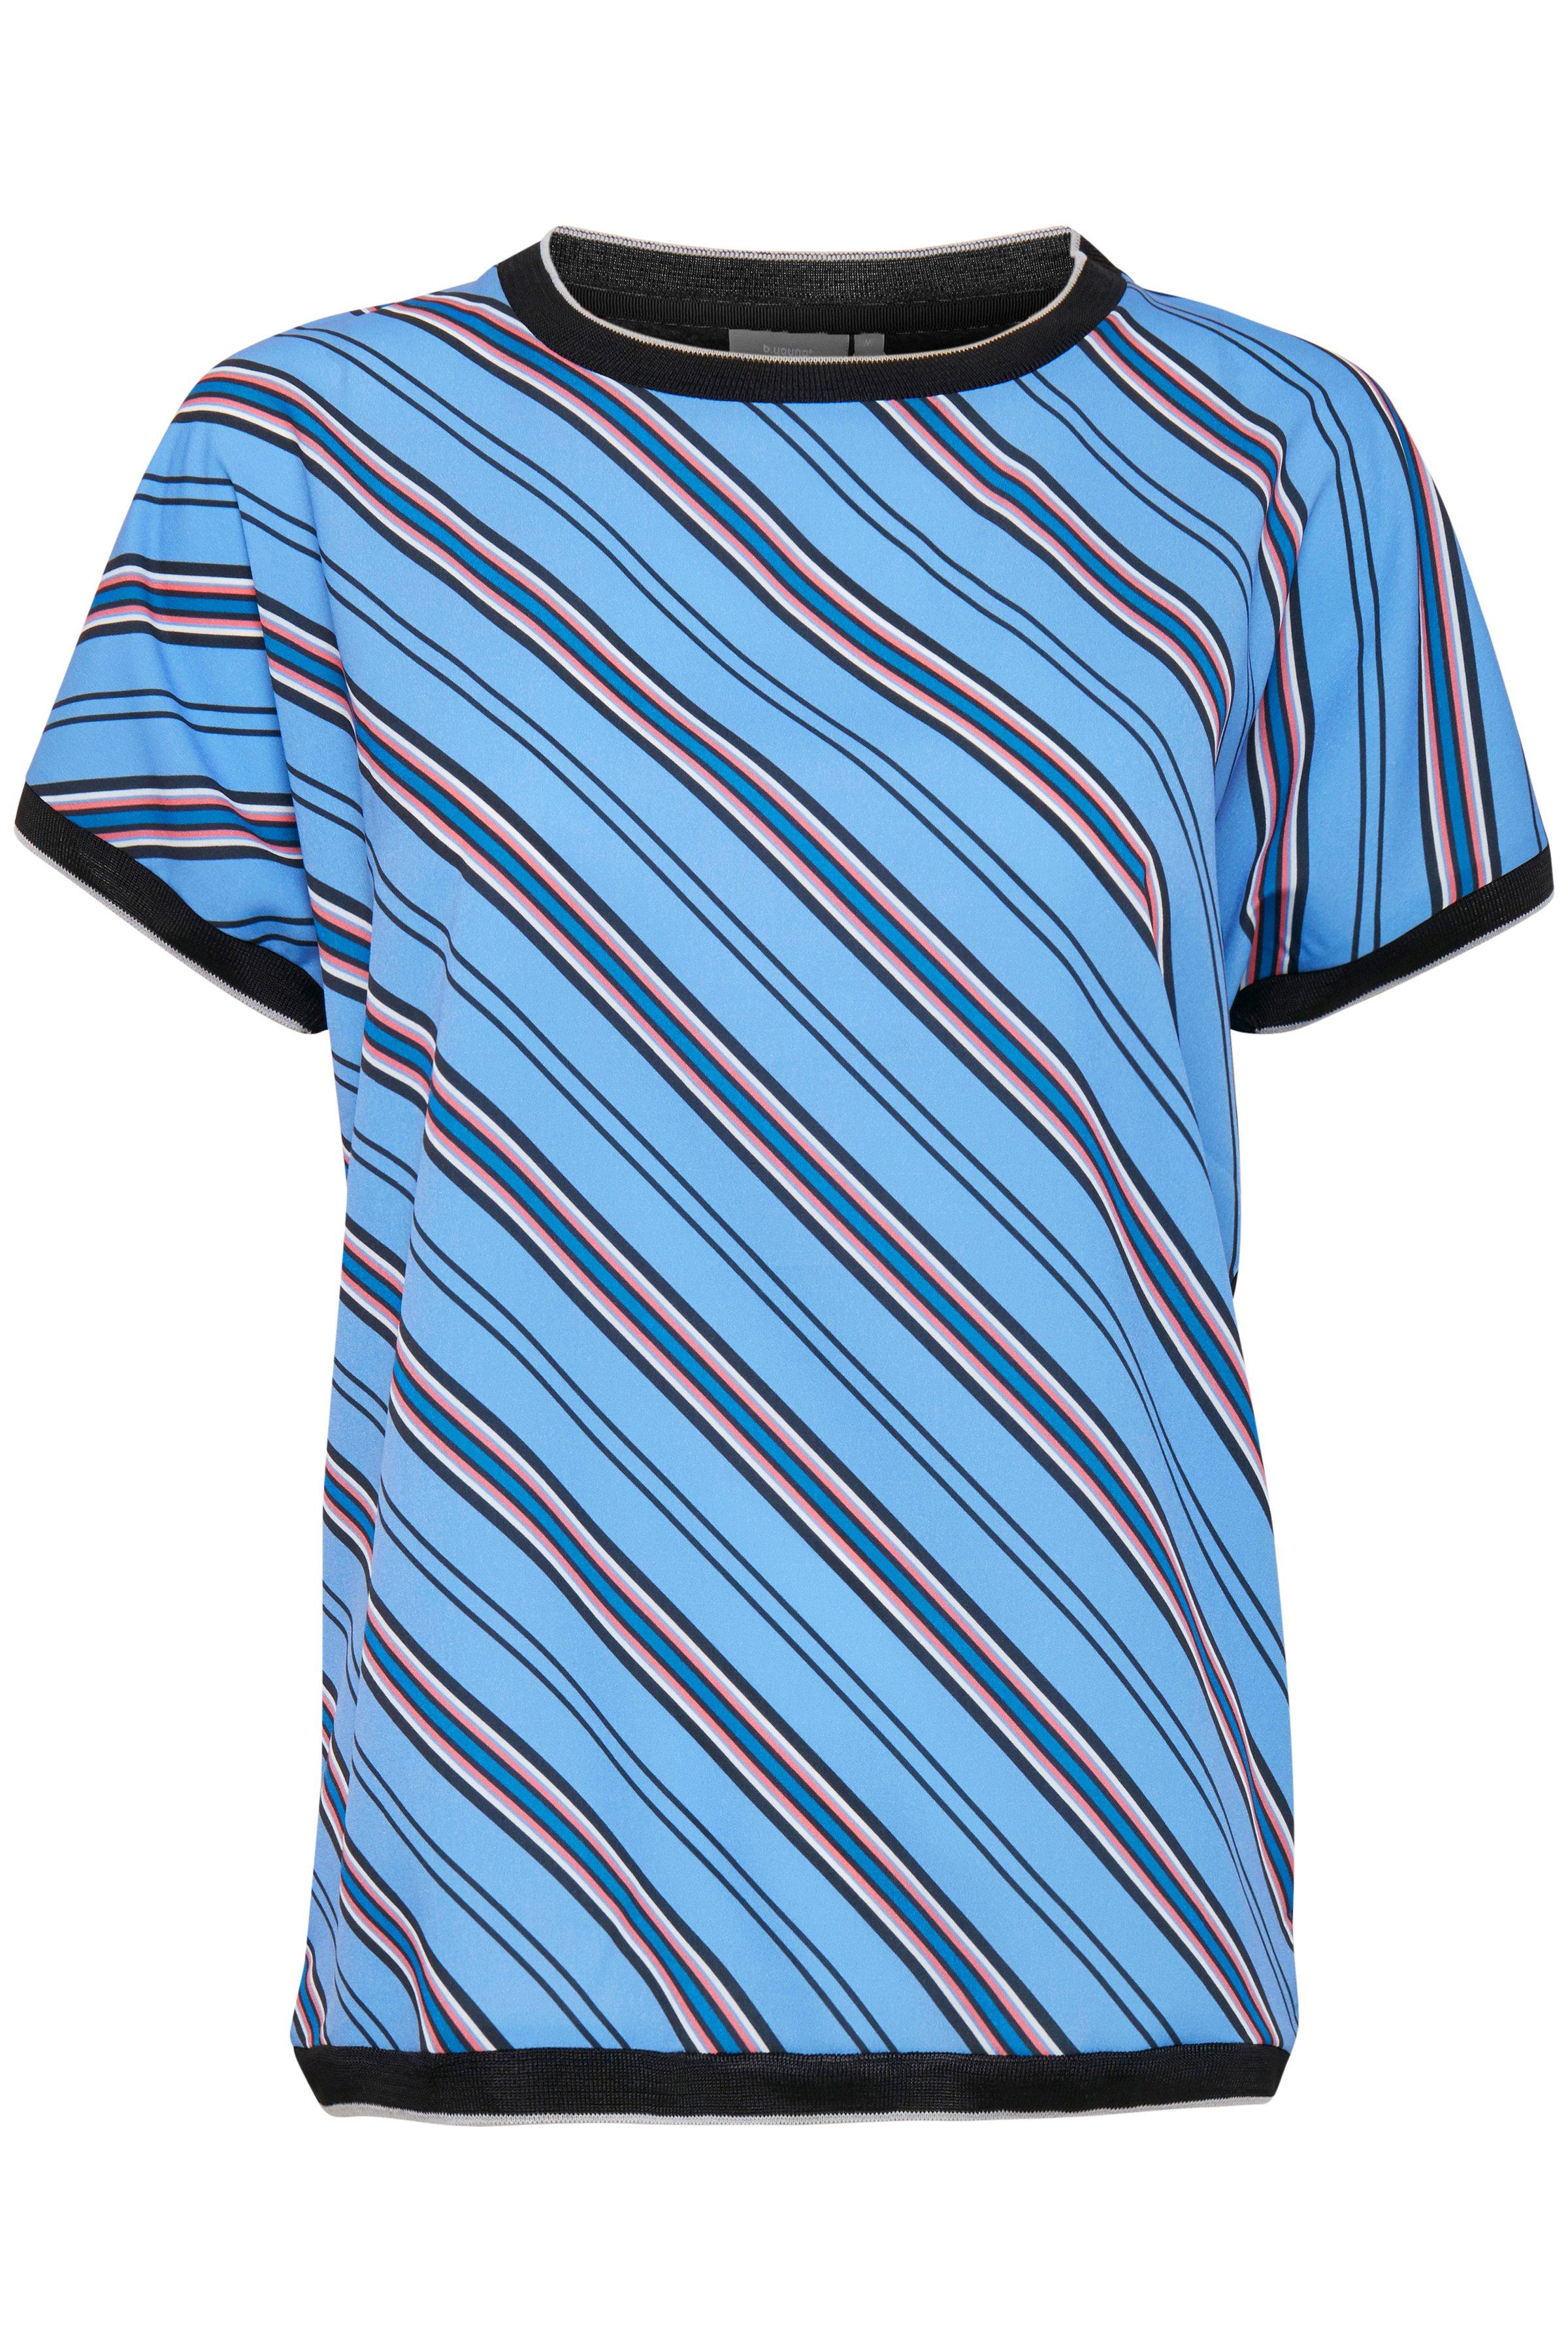 b.young Dame T-shirt korte mouw - Misty blauw/marineblauw